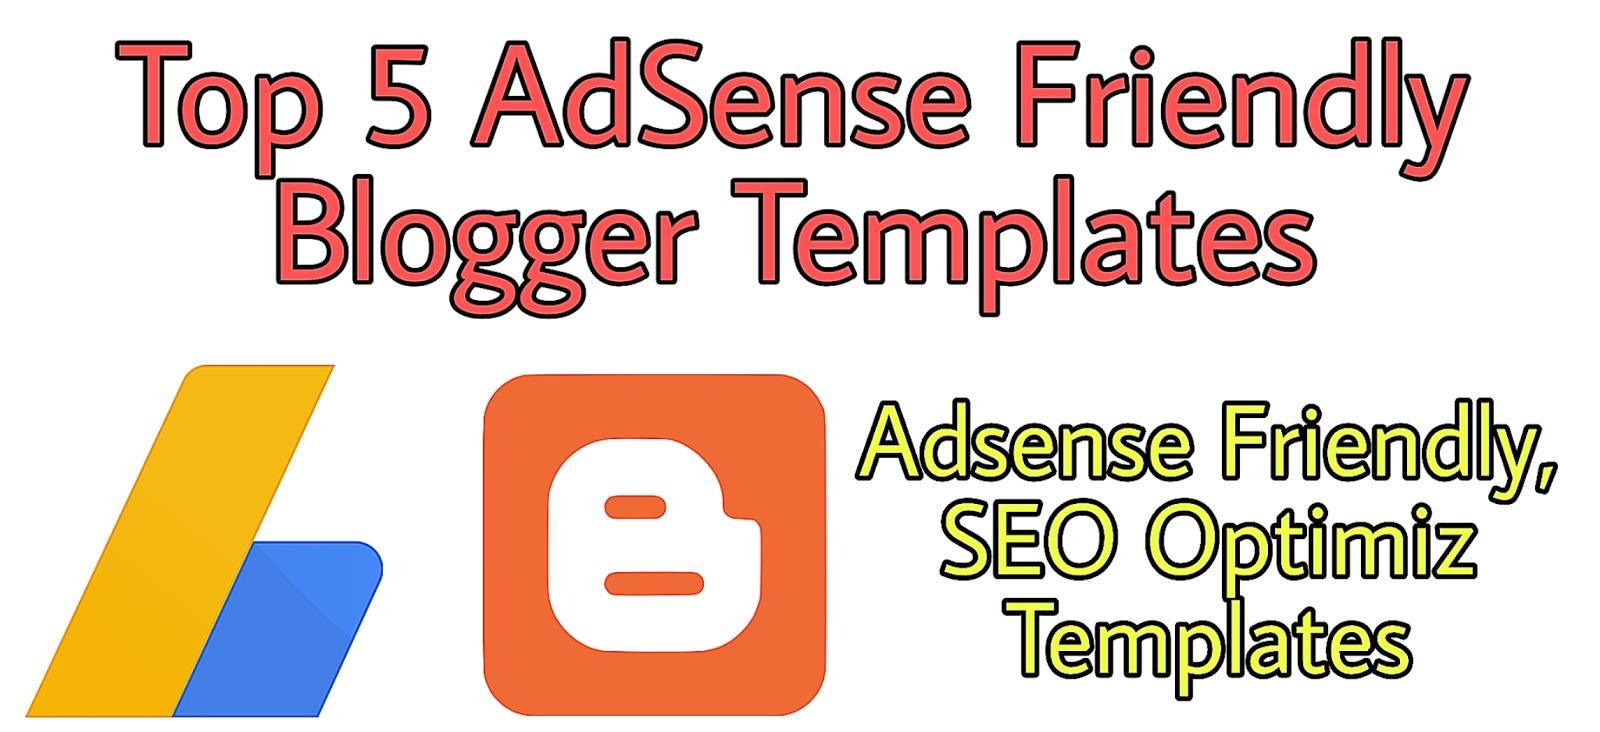 Top 5+ Adsense Friendly Blogger Templates 2020   Responsive   SEO Friendly